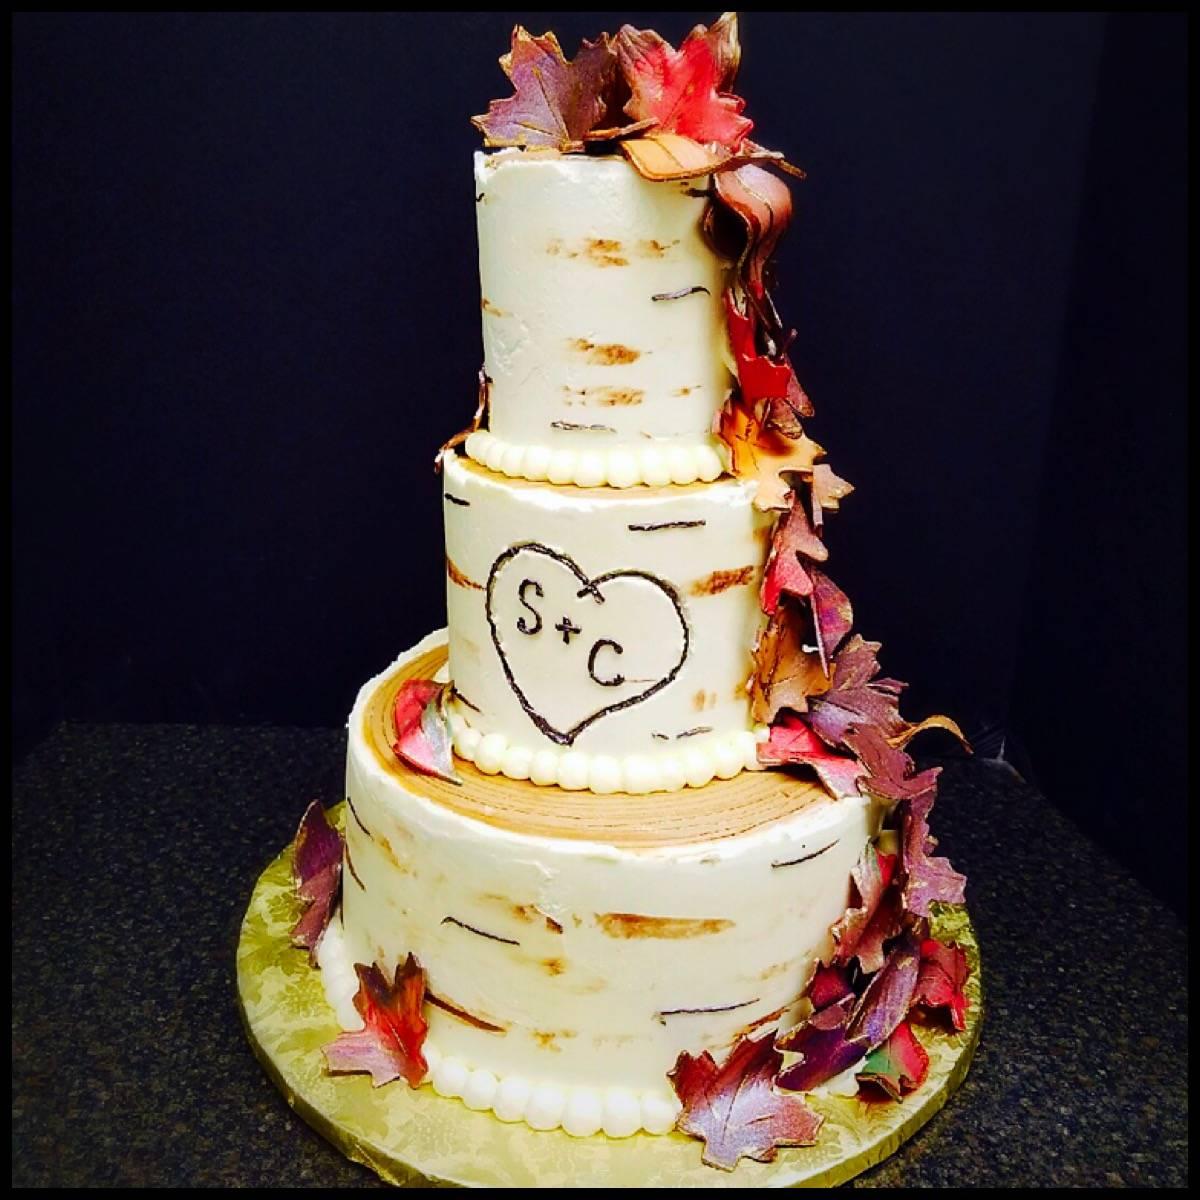 Naked Cake w/ a Cascade of Flowers